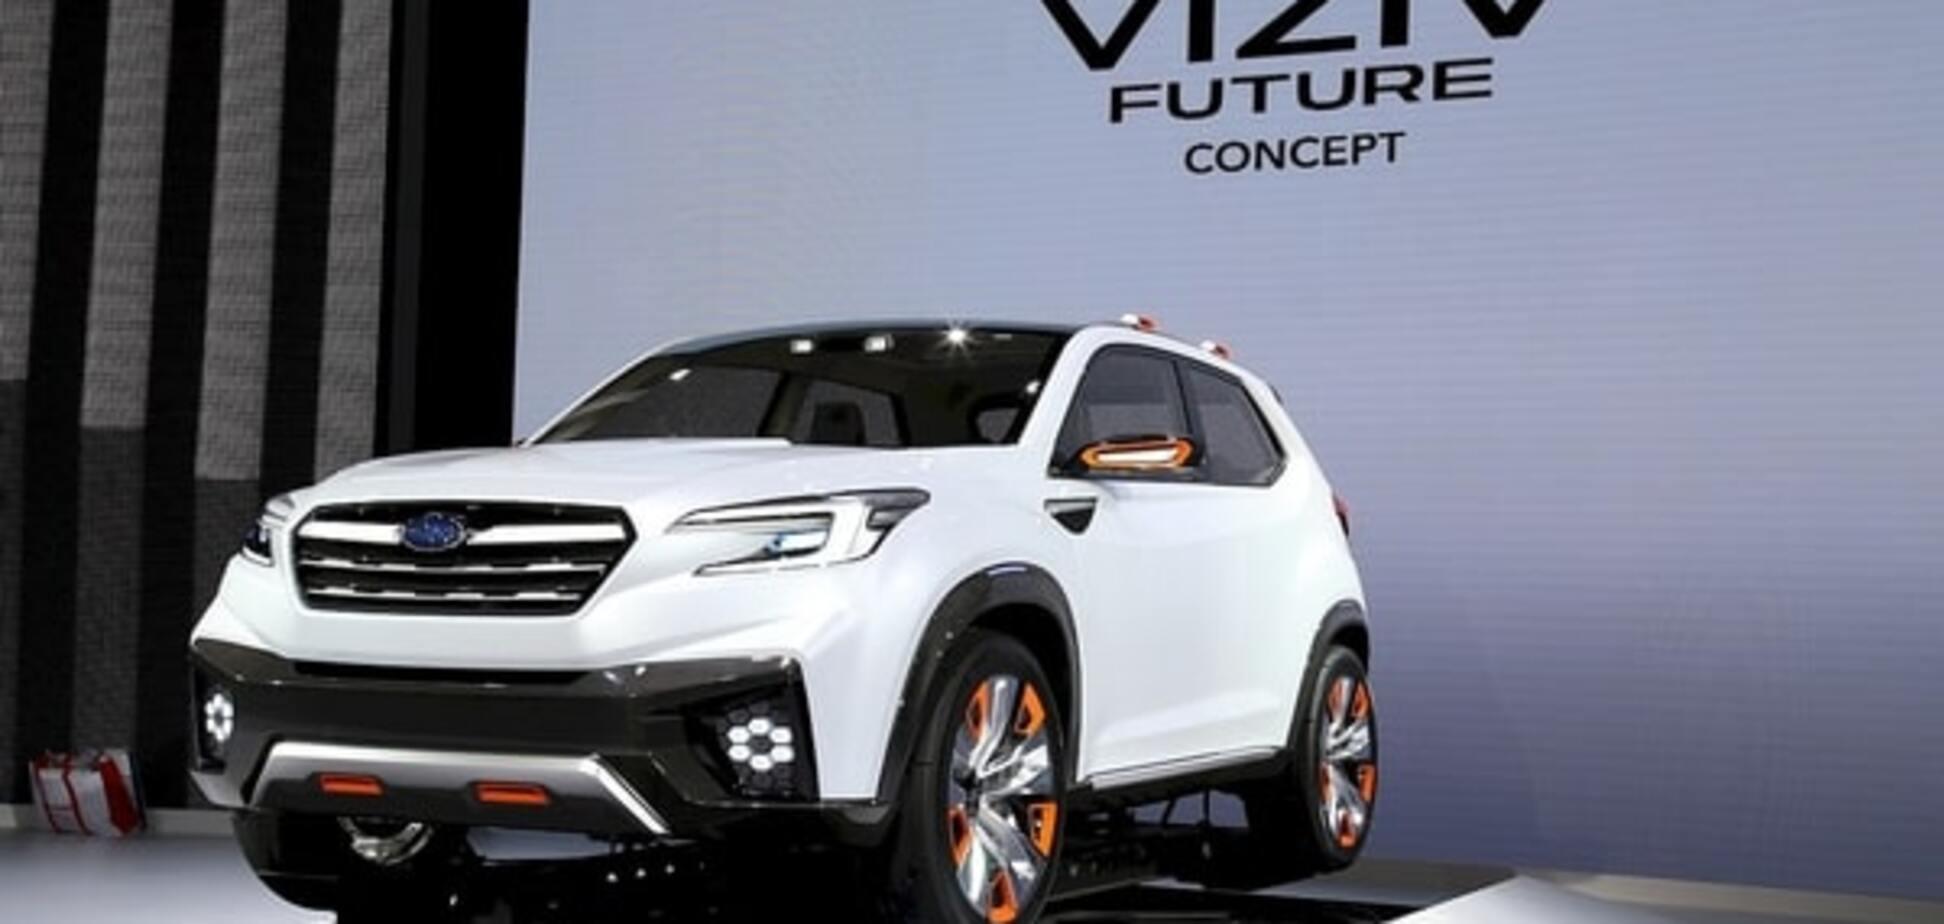 Токийский автосалон: Subaru научил концепт ездить без водителя